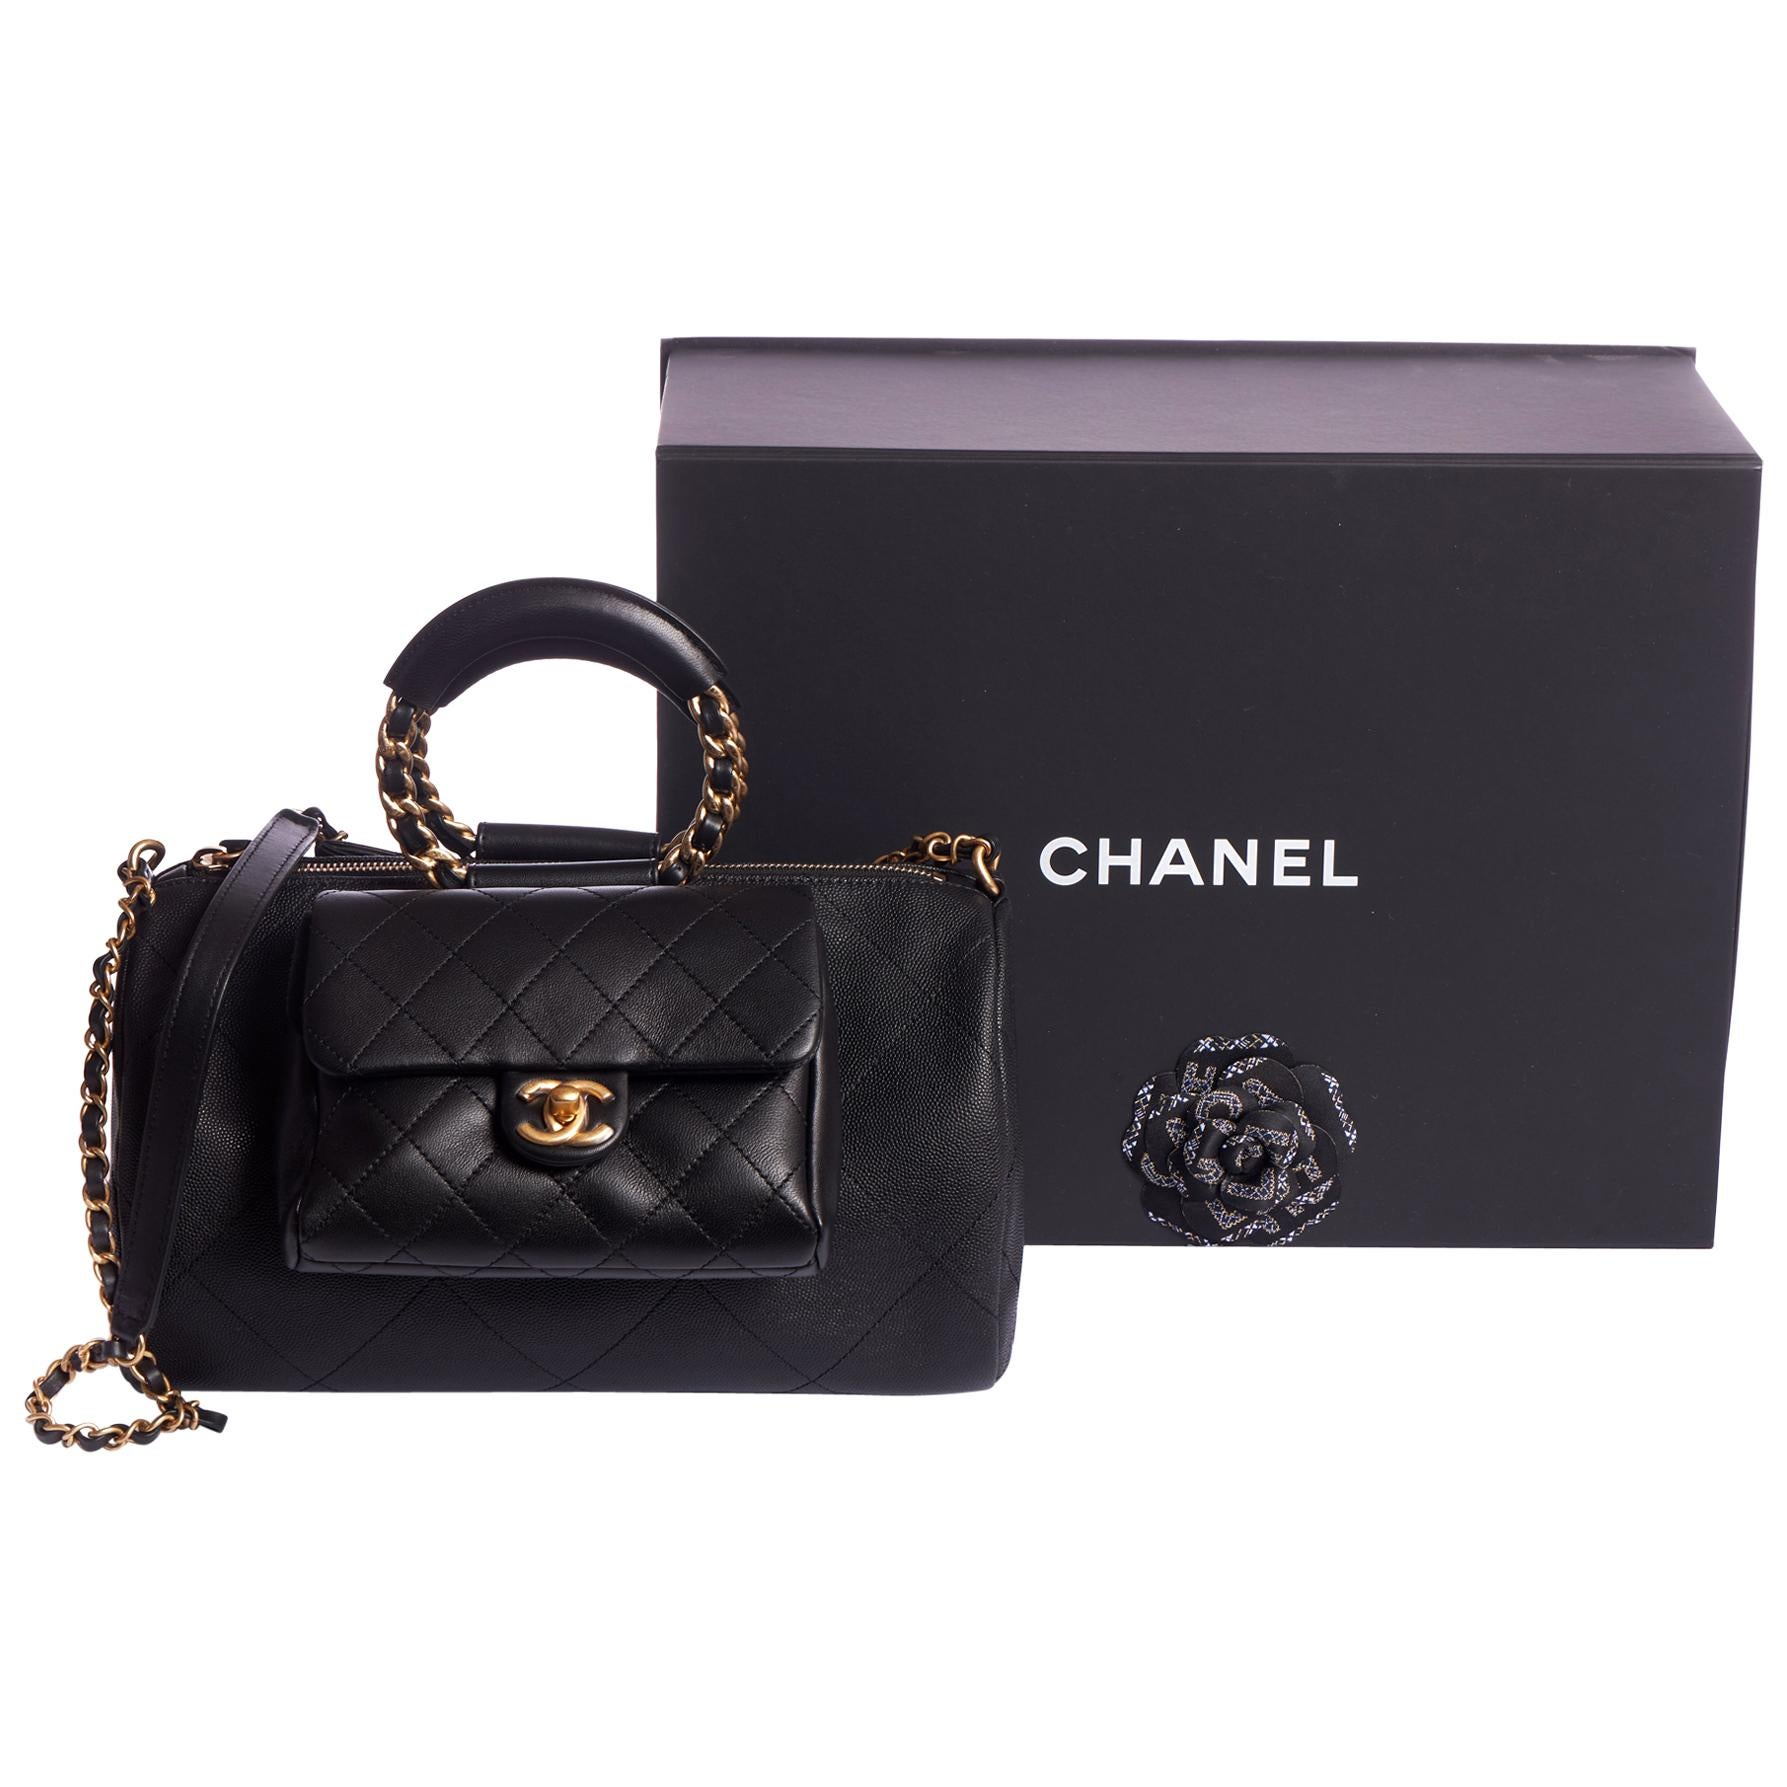 New in Box Chanel 2 Way Black Caviar Handbag